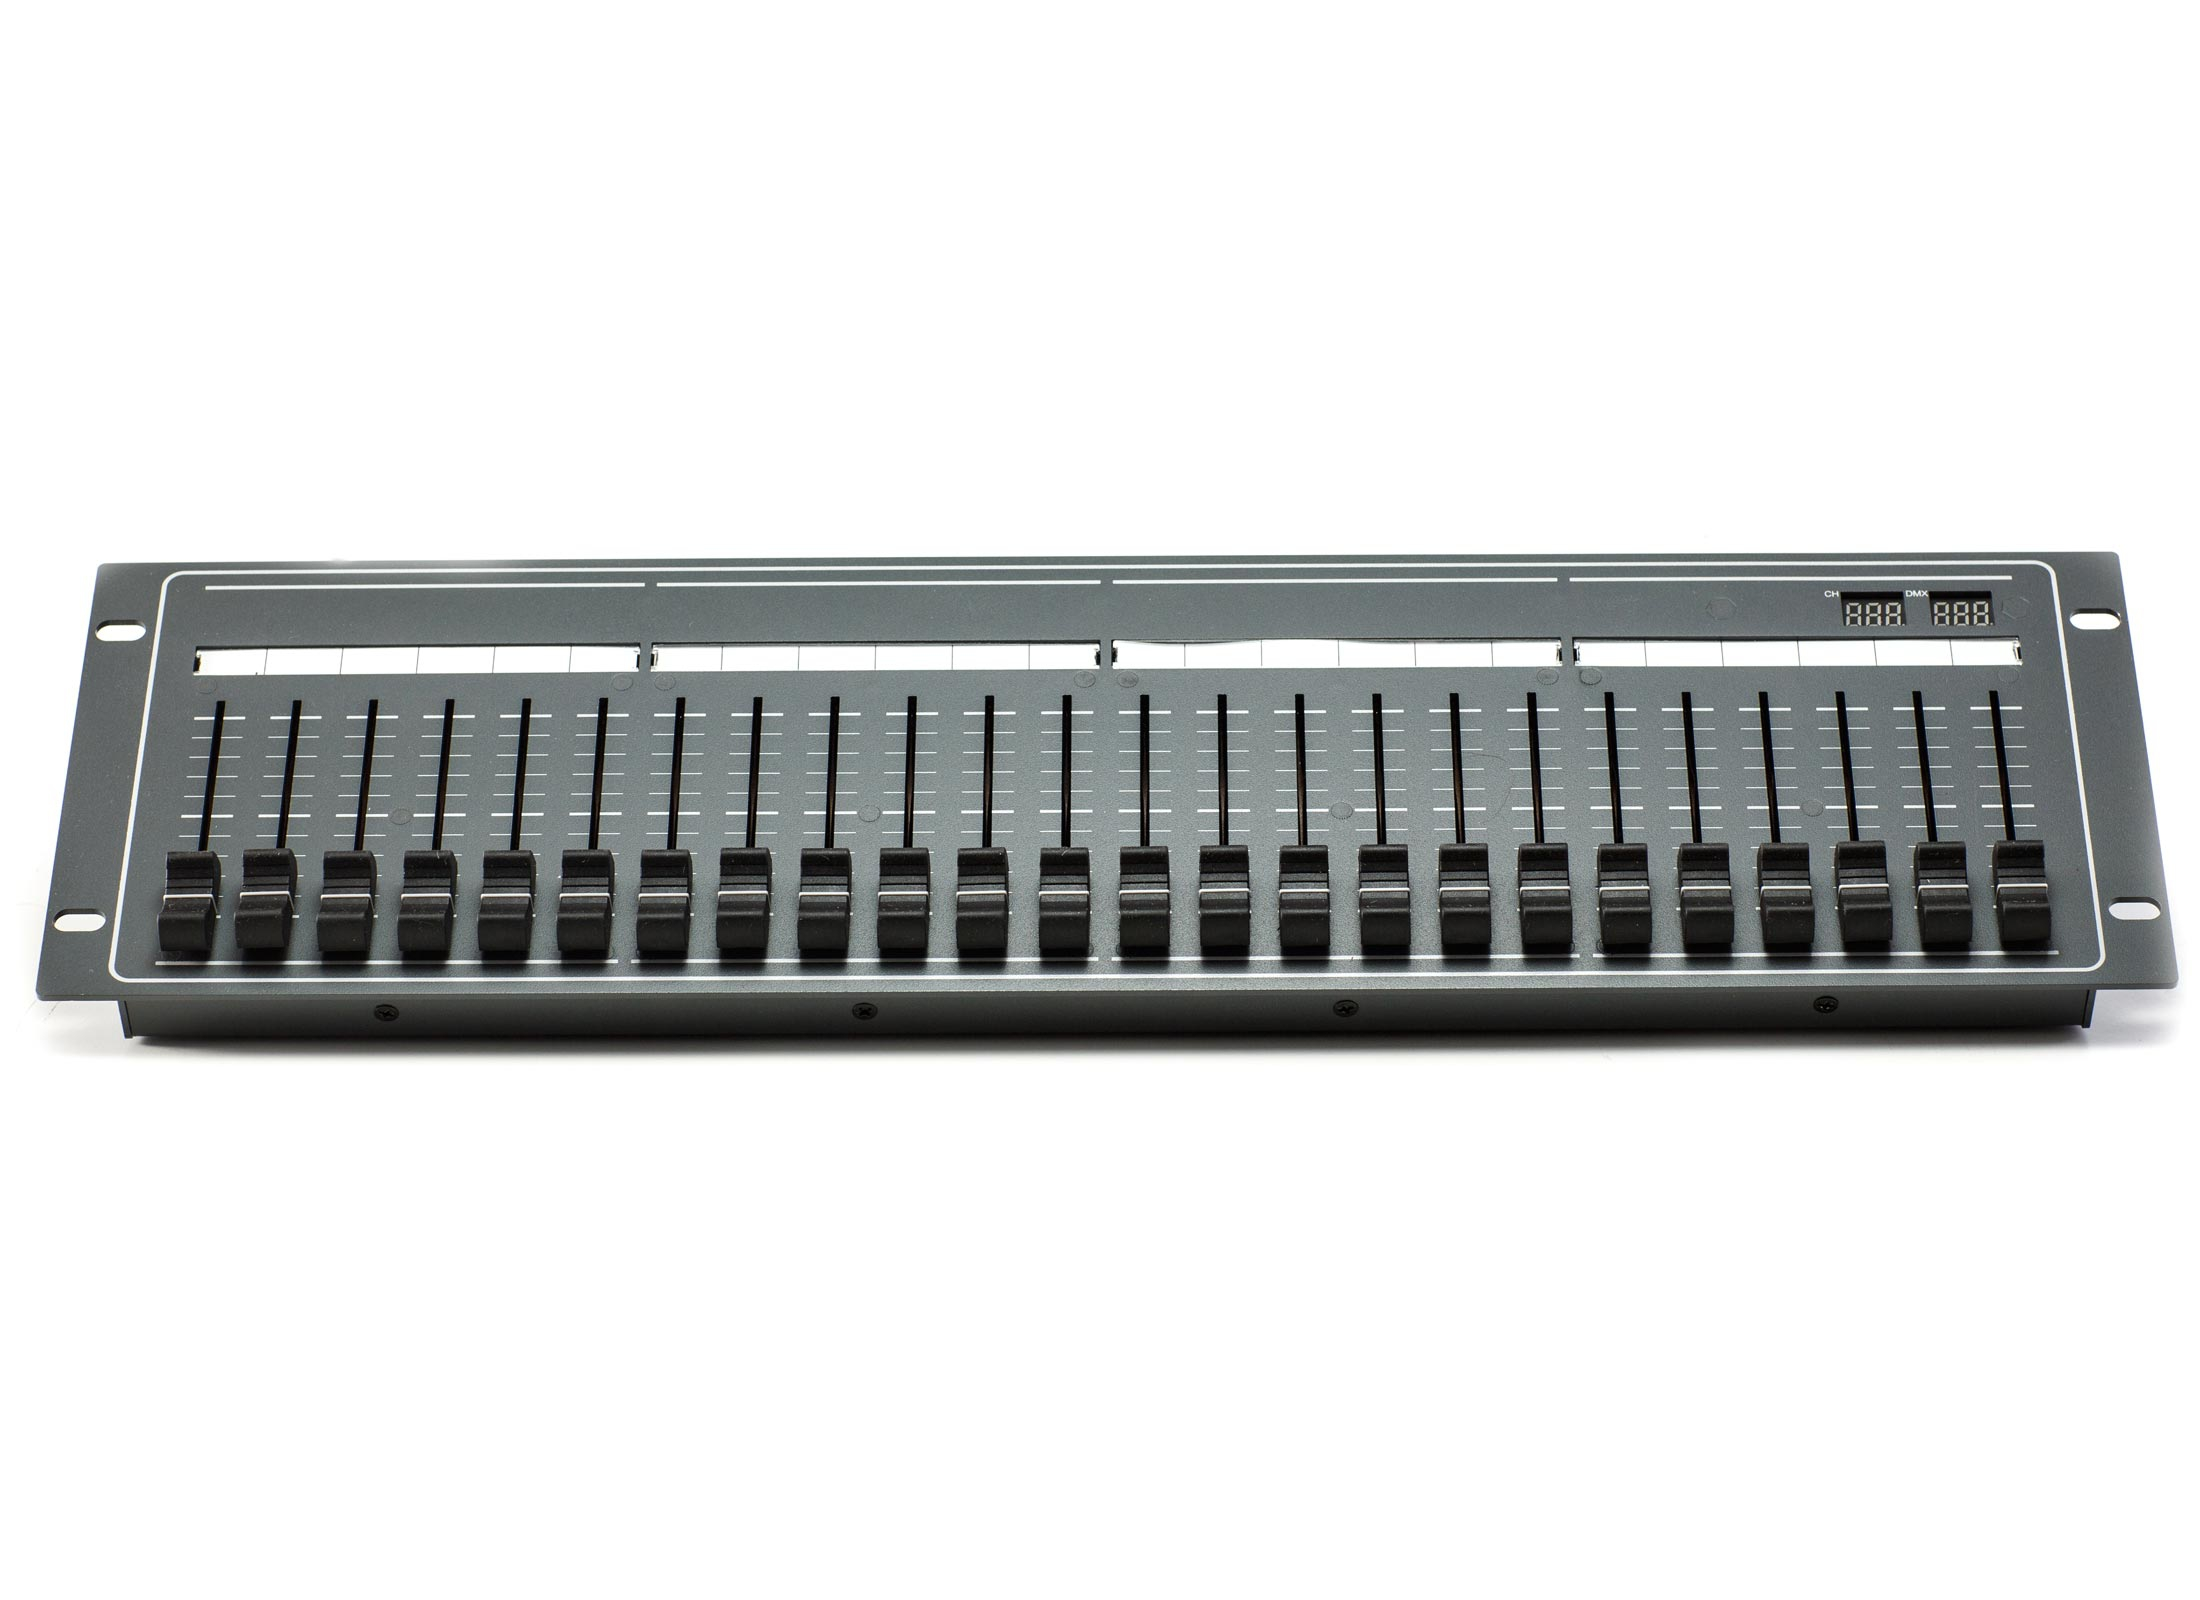 Ehrgeiz SimpleDesk 24 DMX Controller Online At Low Prices At Huss ...